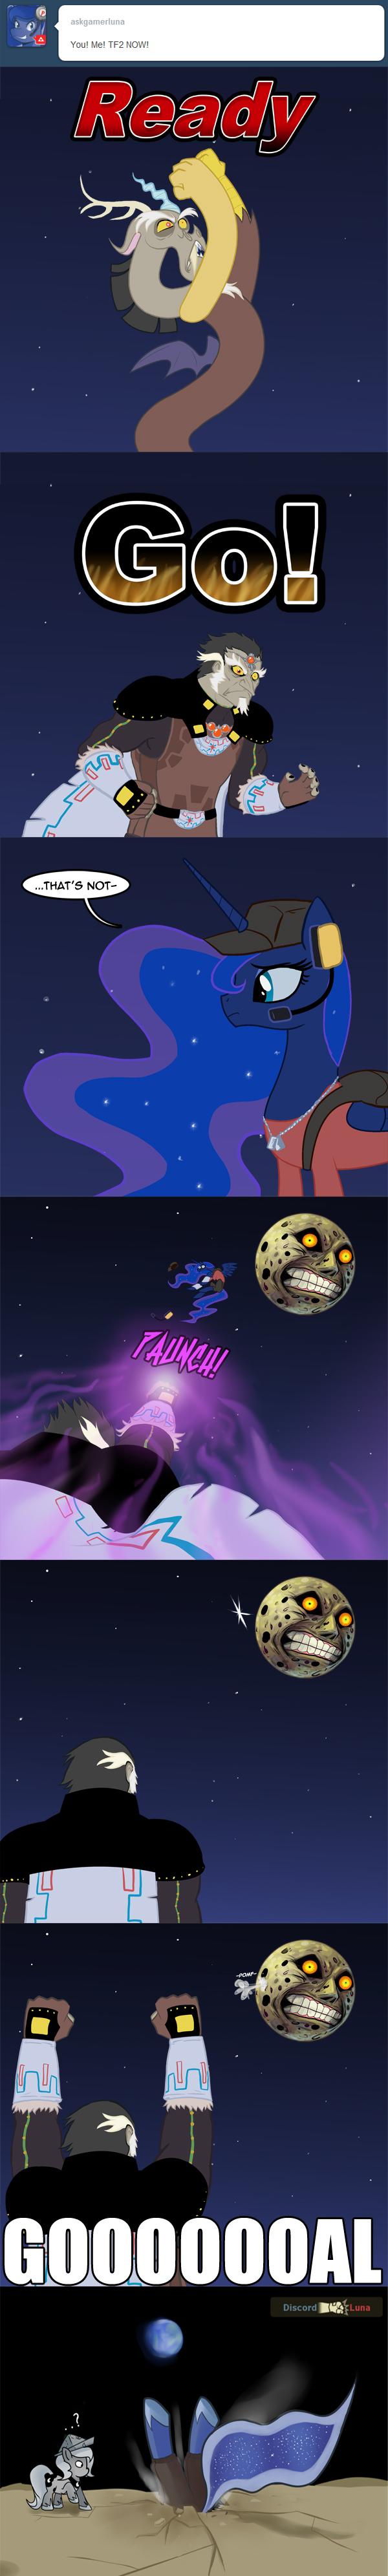 GOOOOOOAL!. source: .. Now, fight me. MLP tumblr Discord Ganondorf Gamer Luna The moon goal